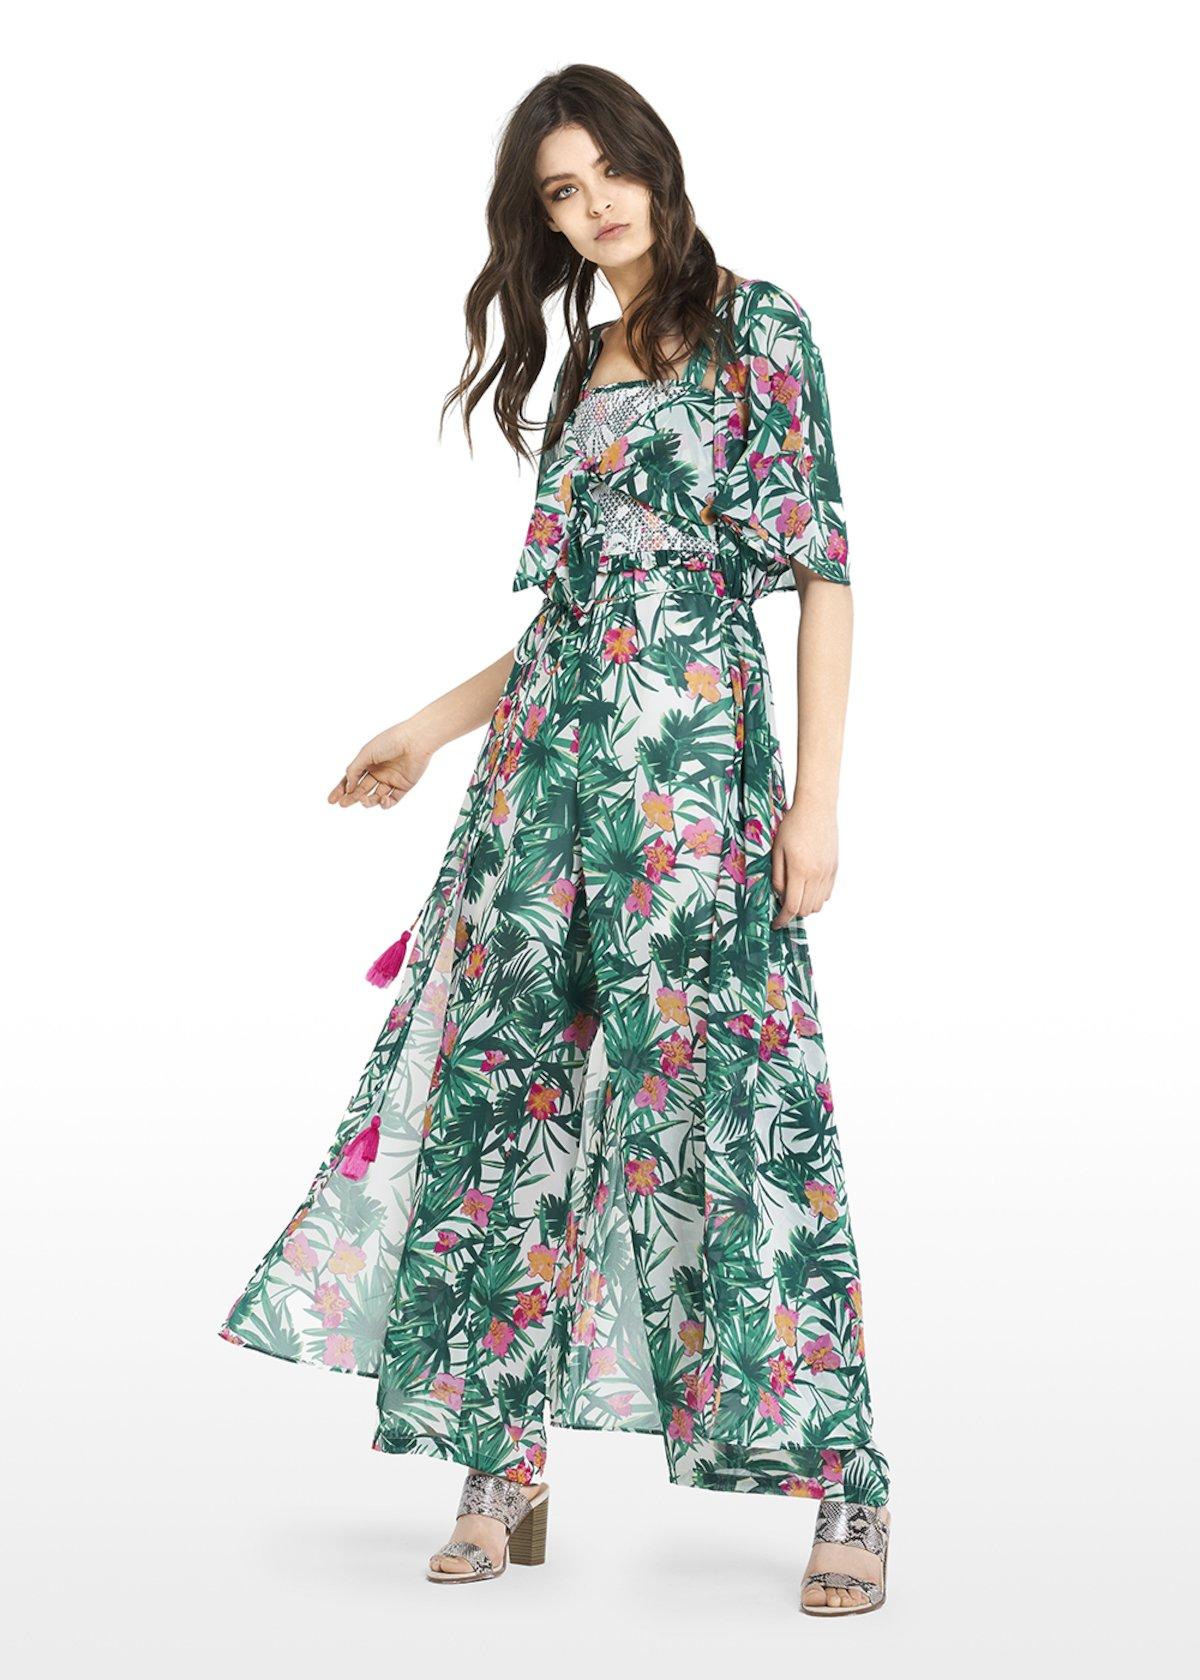 Carl shirt dress with drawstring and tassel at the waist - White\ Amazon\ Fantasia - Woman